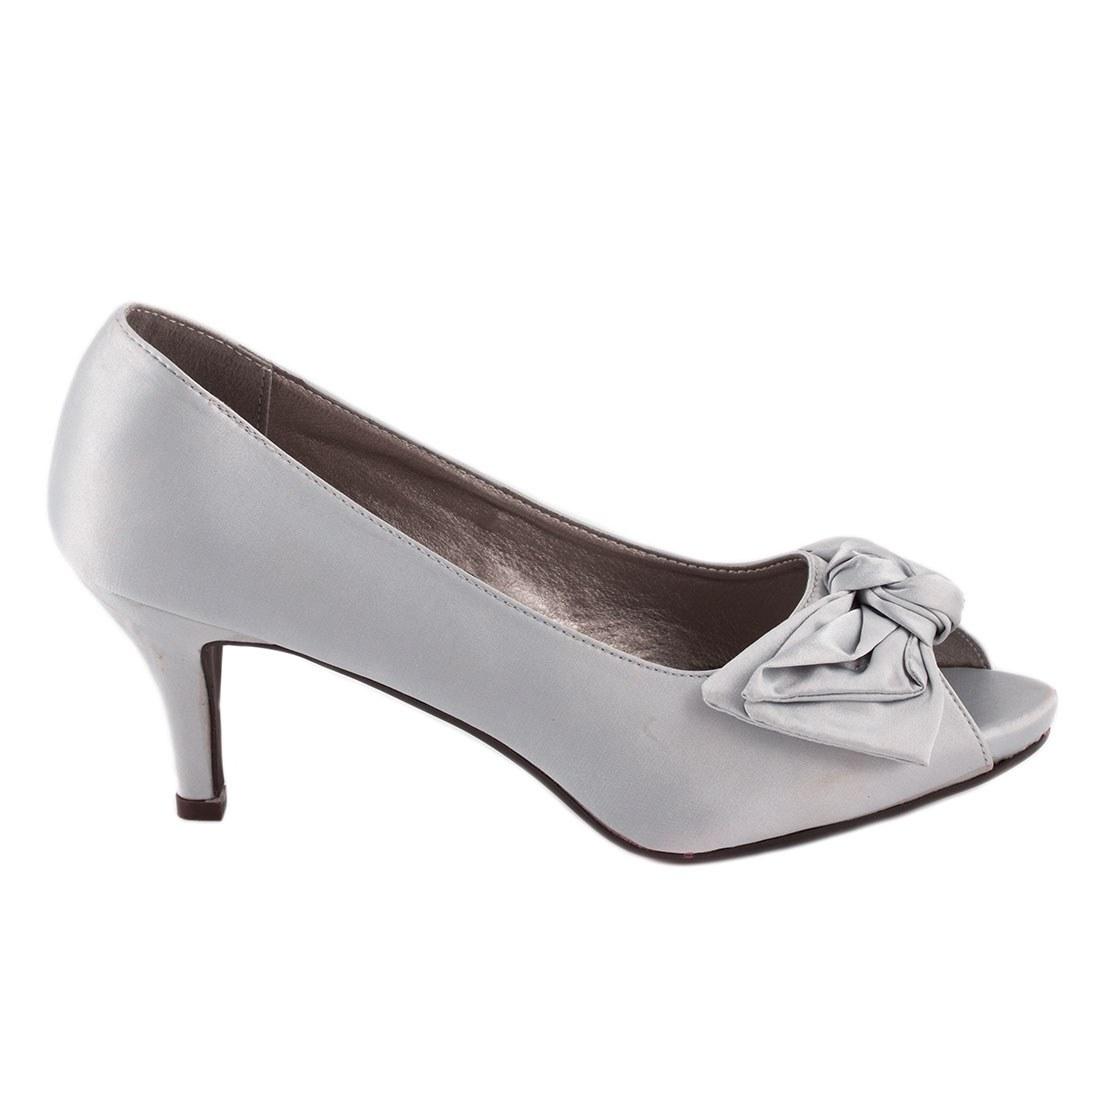 Pantofi dama A2191-GRI-D-O